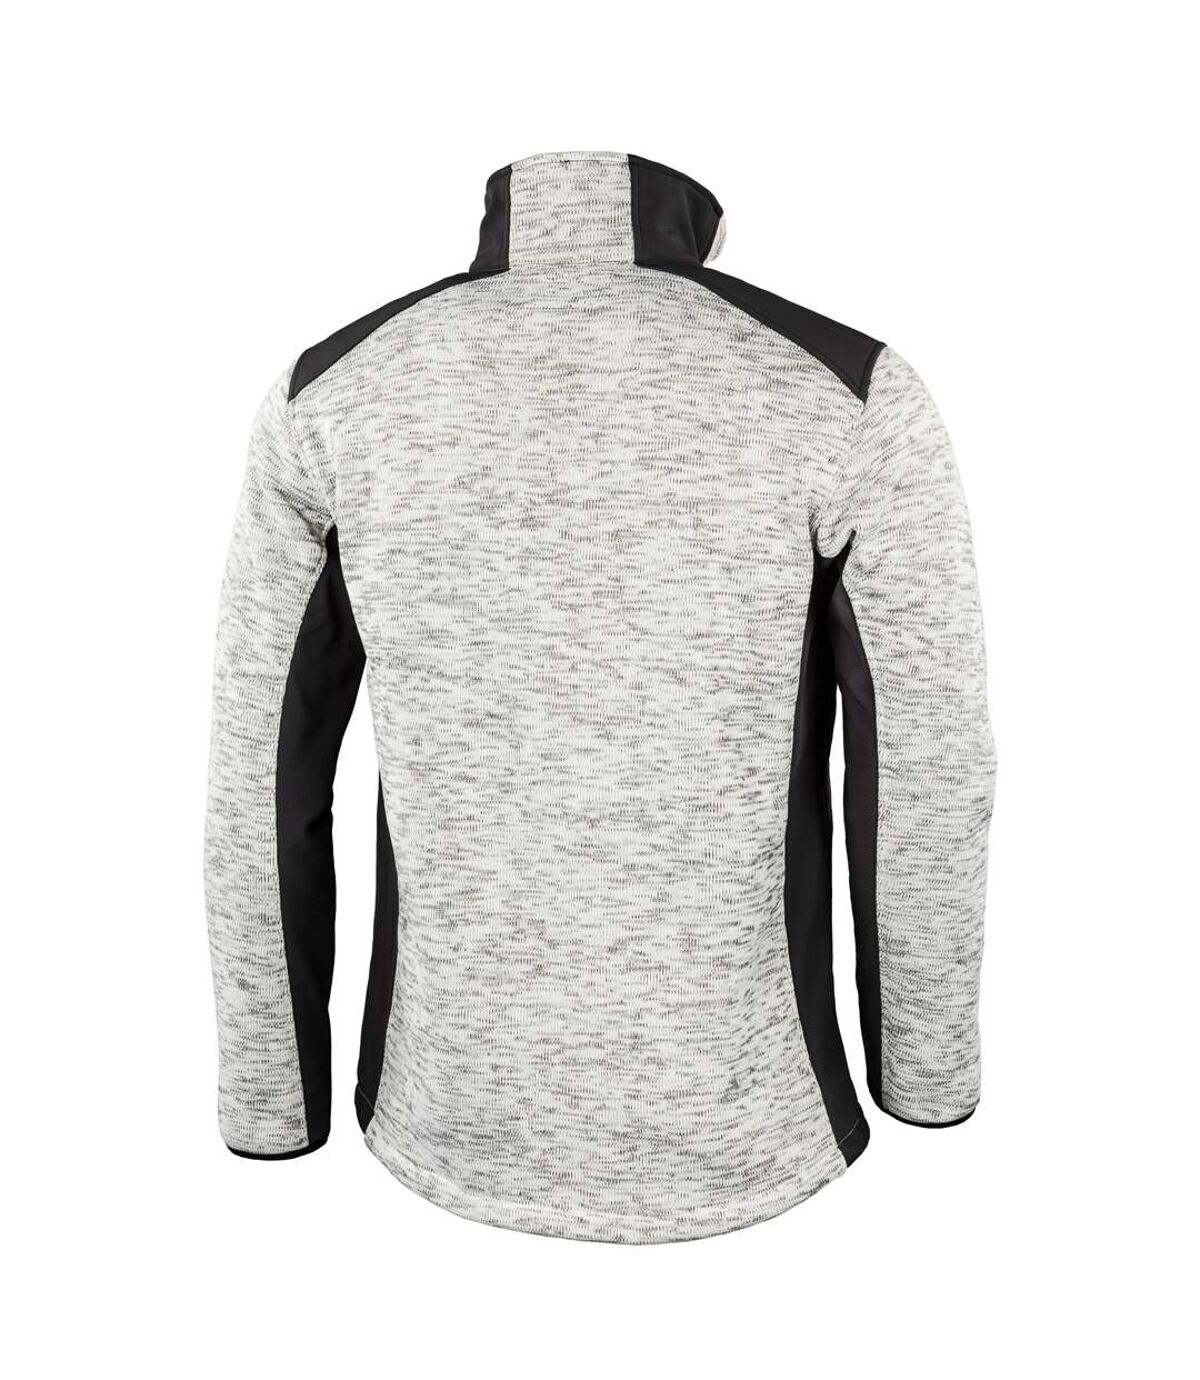 Veste polaire tricoté softshell Albatros STIRLING